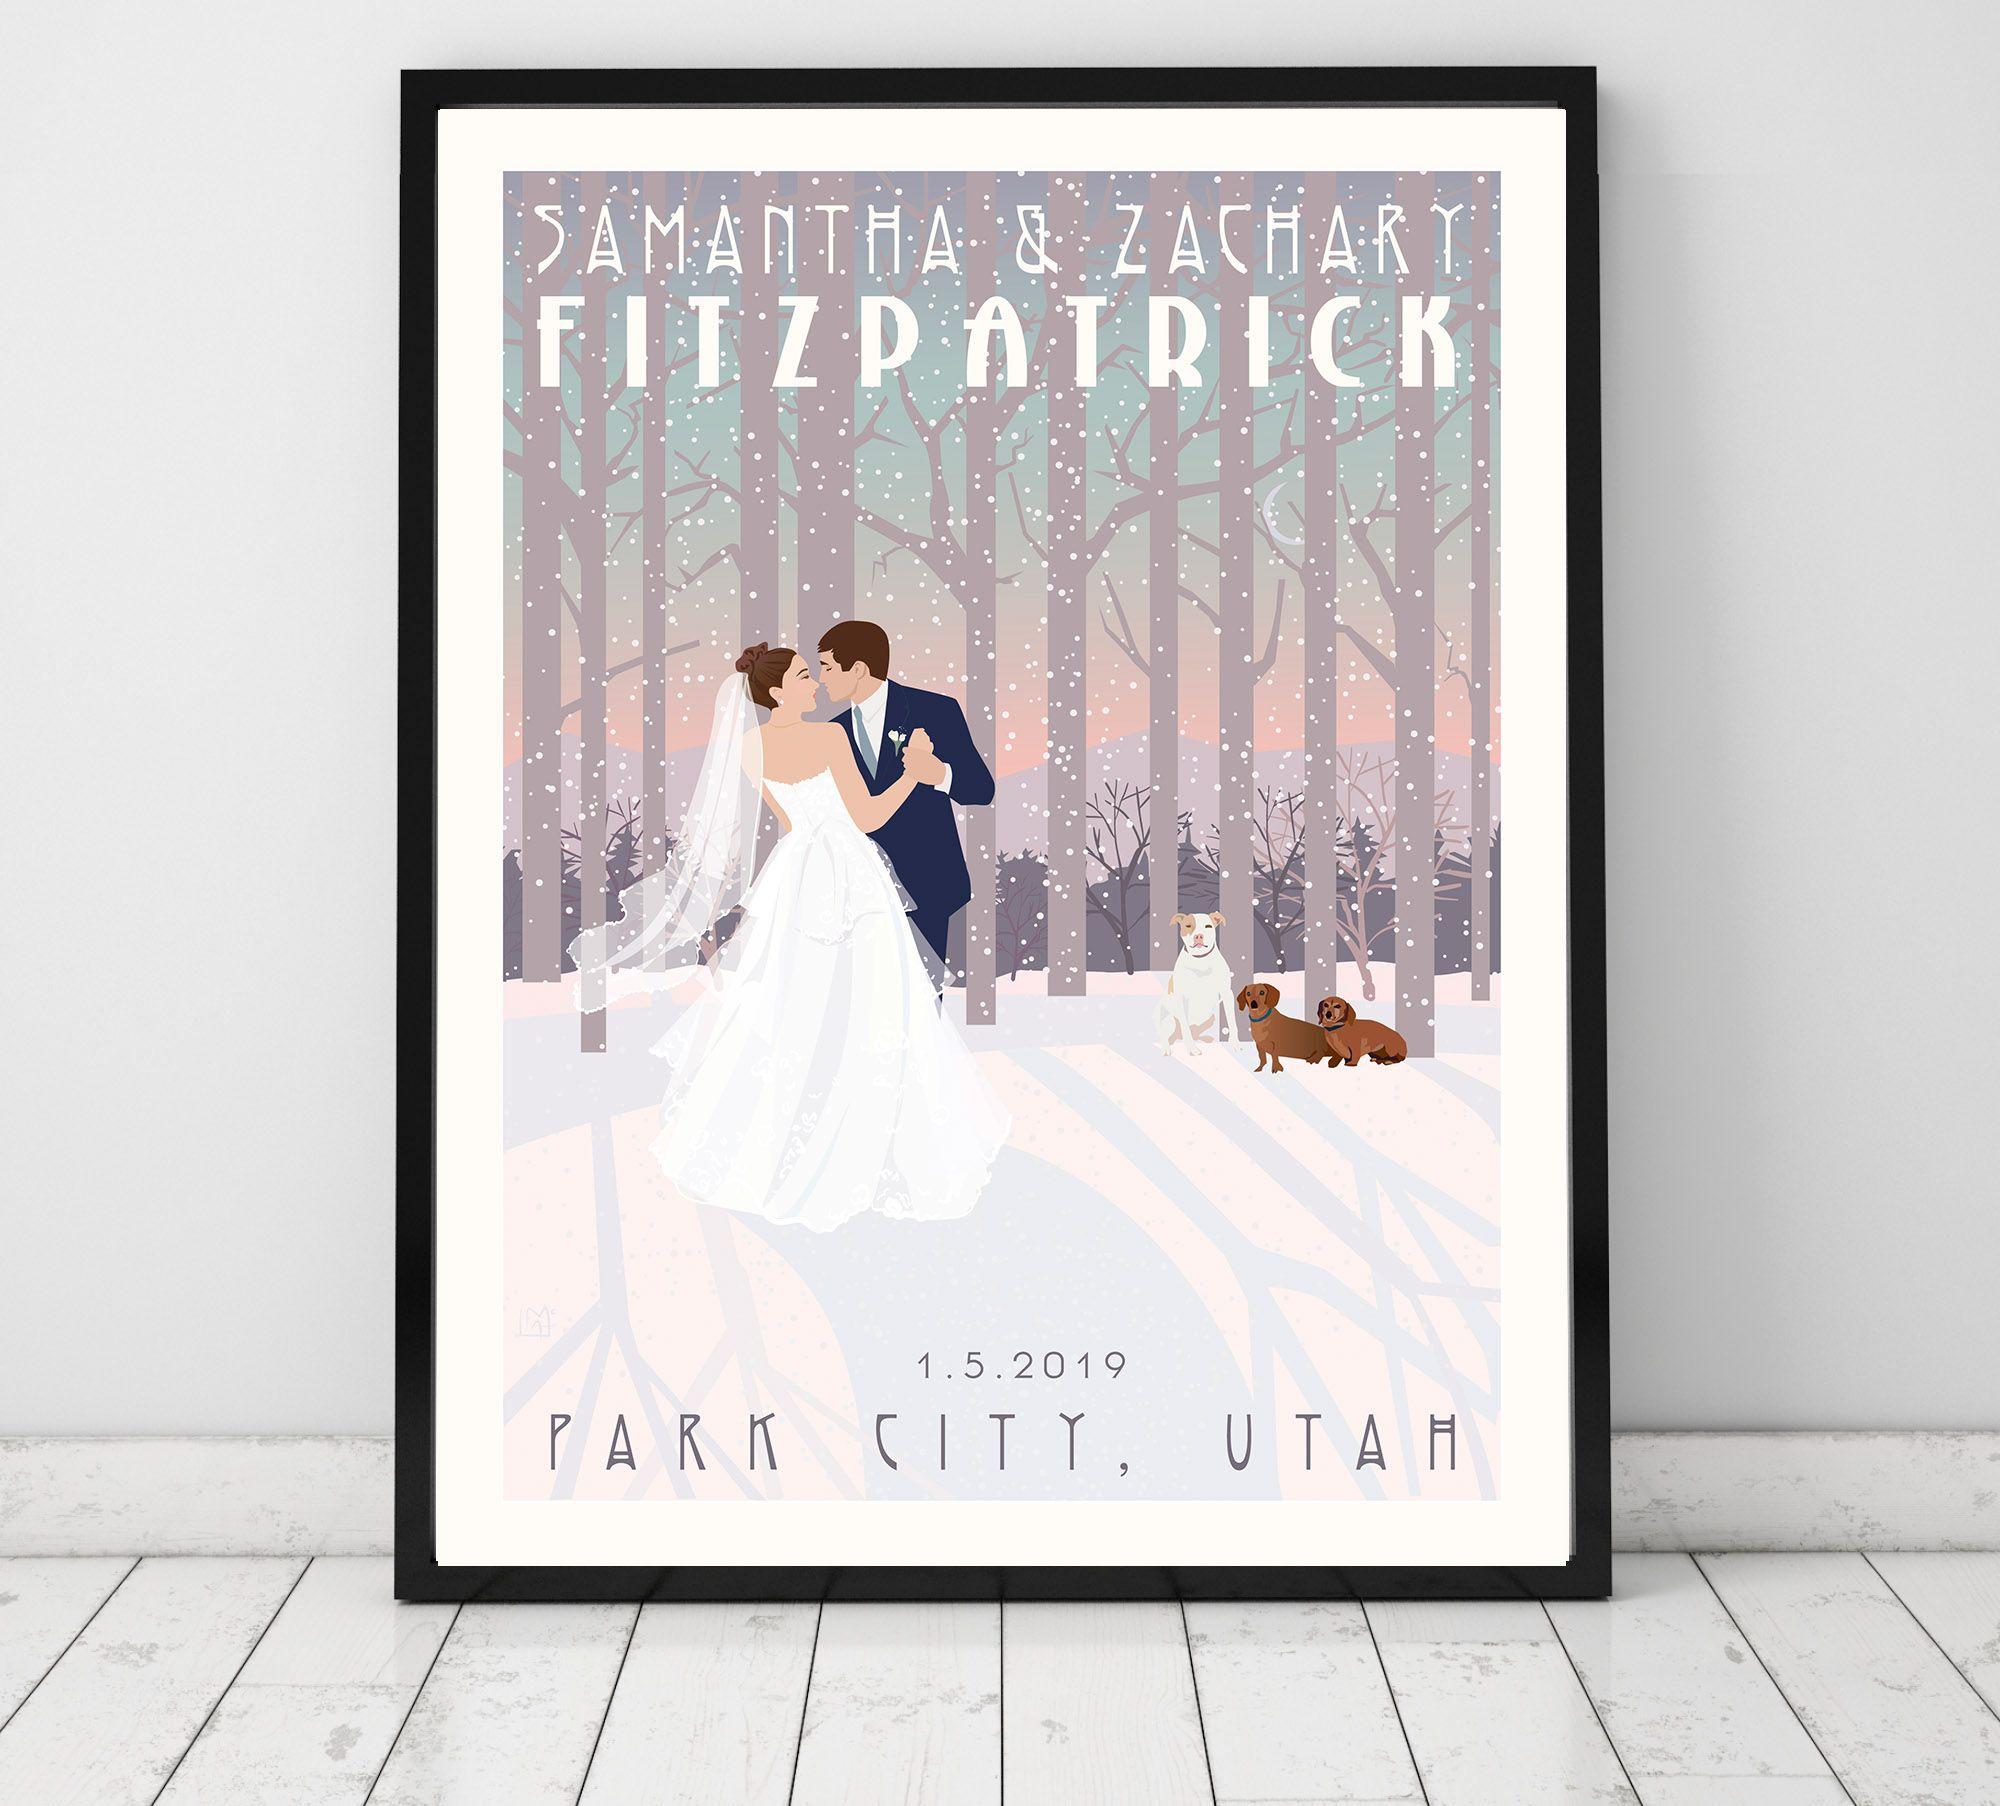 30 Unique And Breathtaking Wedding Backdrop Ideas: Pin On Sentimental Reasons Custom Art